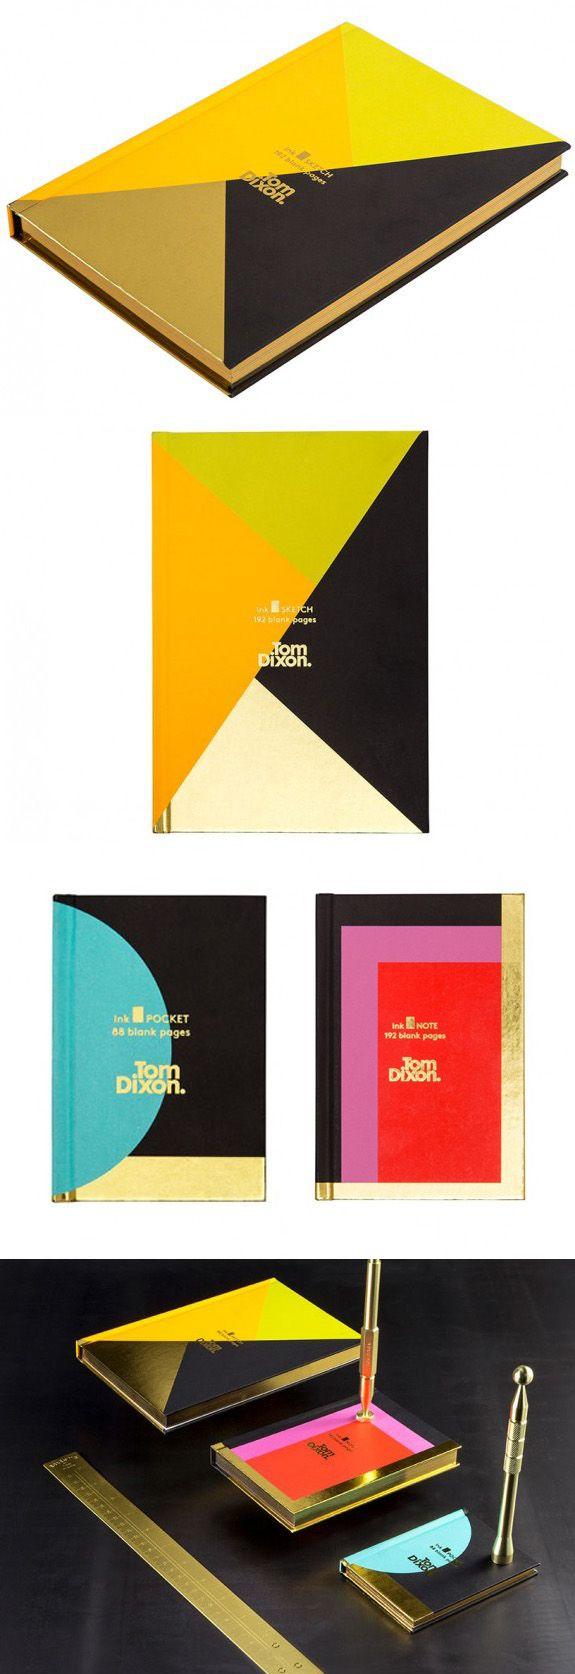 Tom Dixon Notebooks - Ink Pocket and Sketch